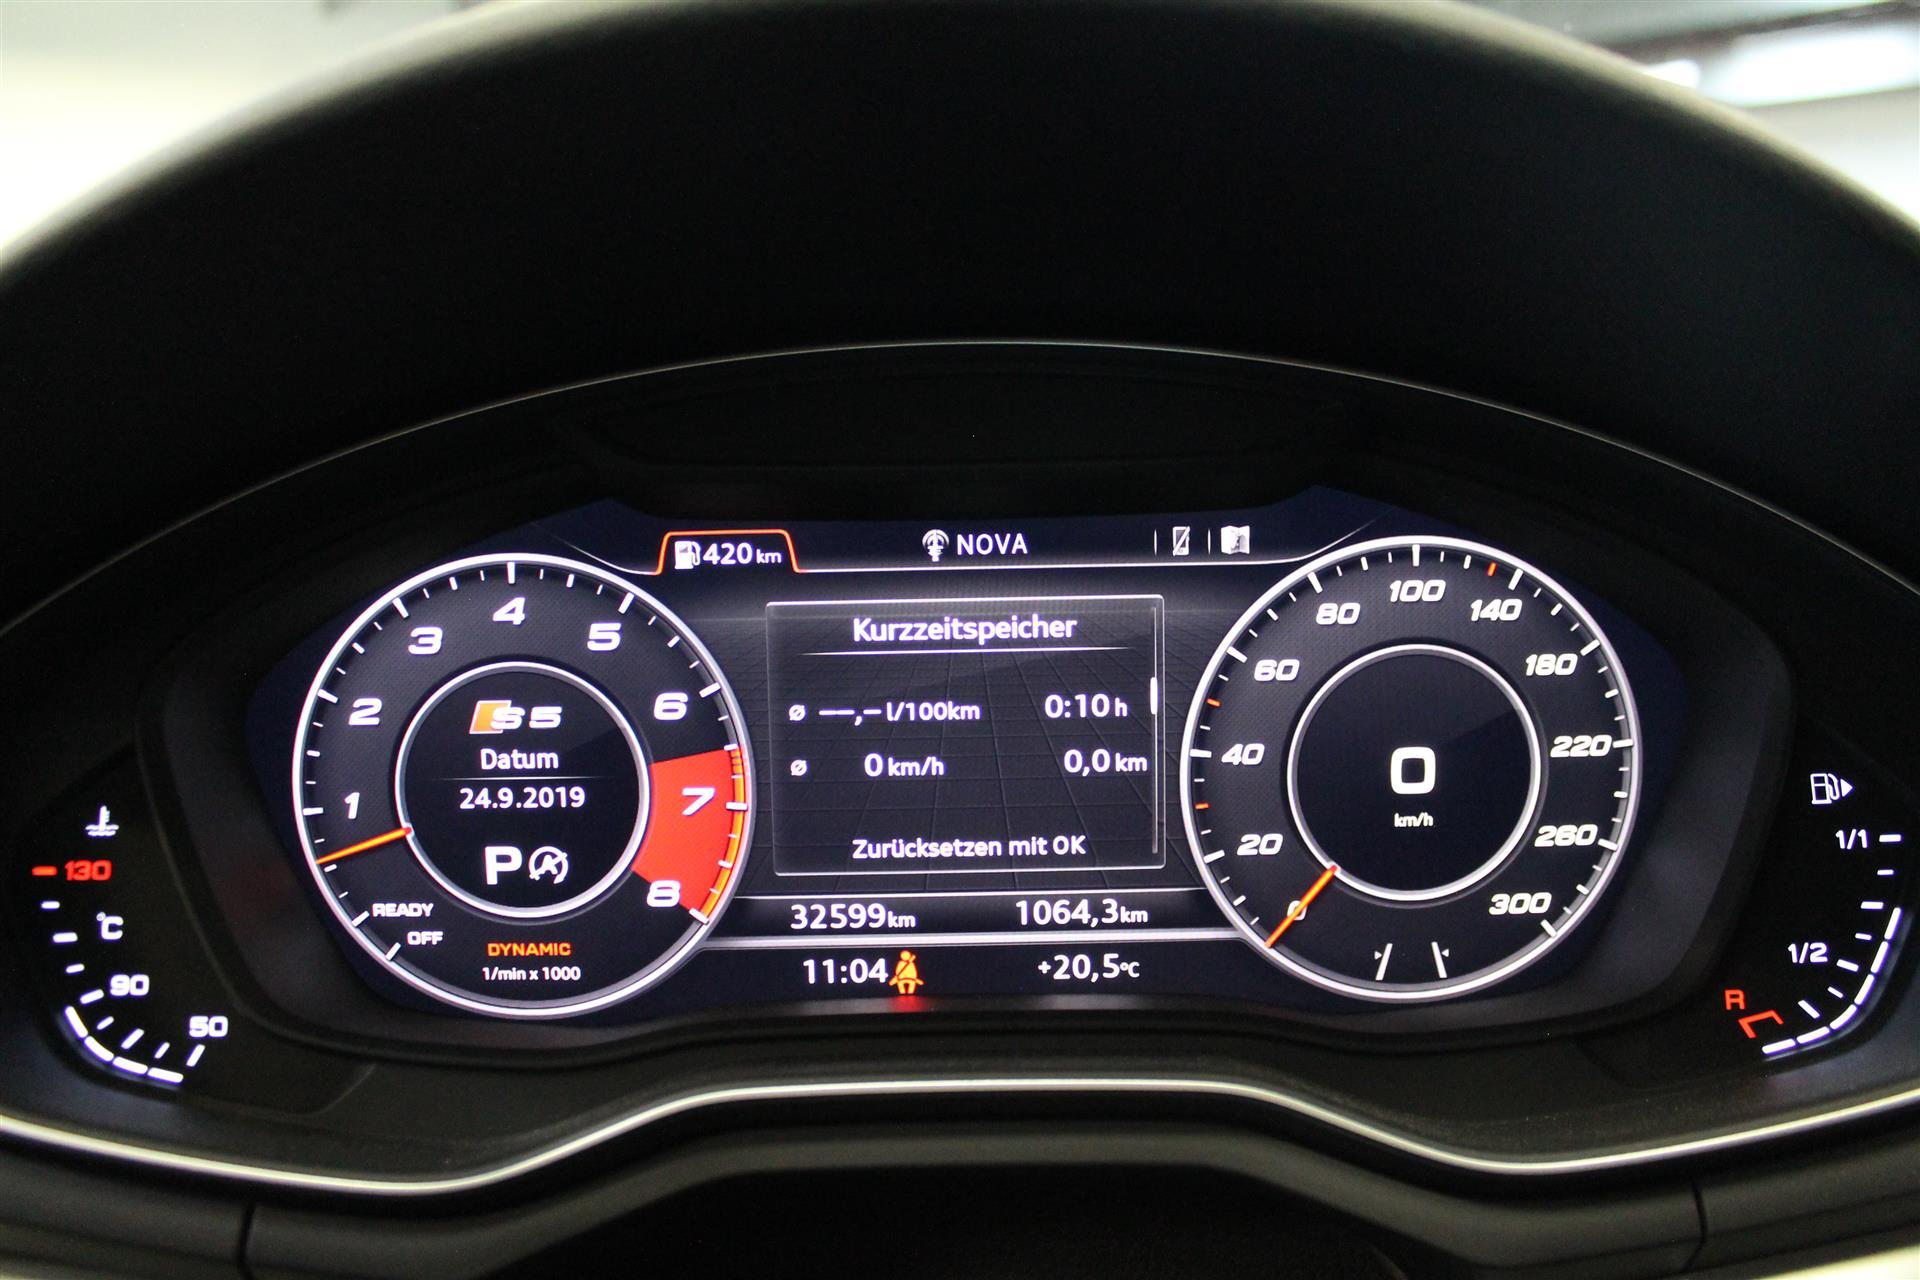 Sportback 3,0 TFSI Quattro Tiptr. 354HK 5d 8g Trinl. Gear image4